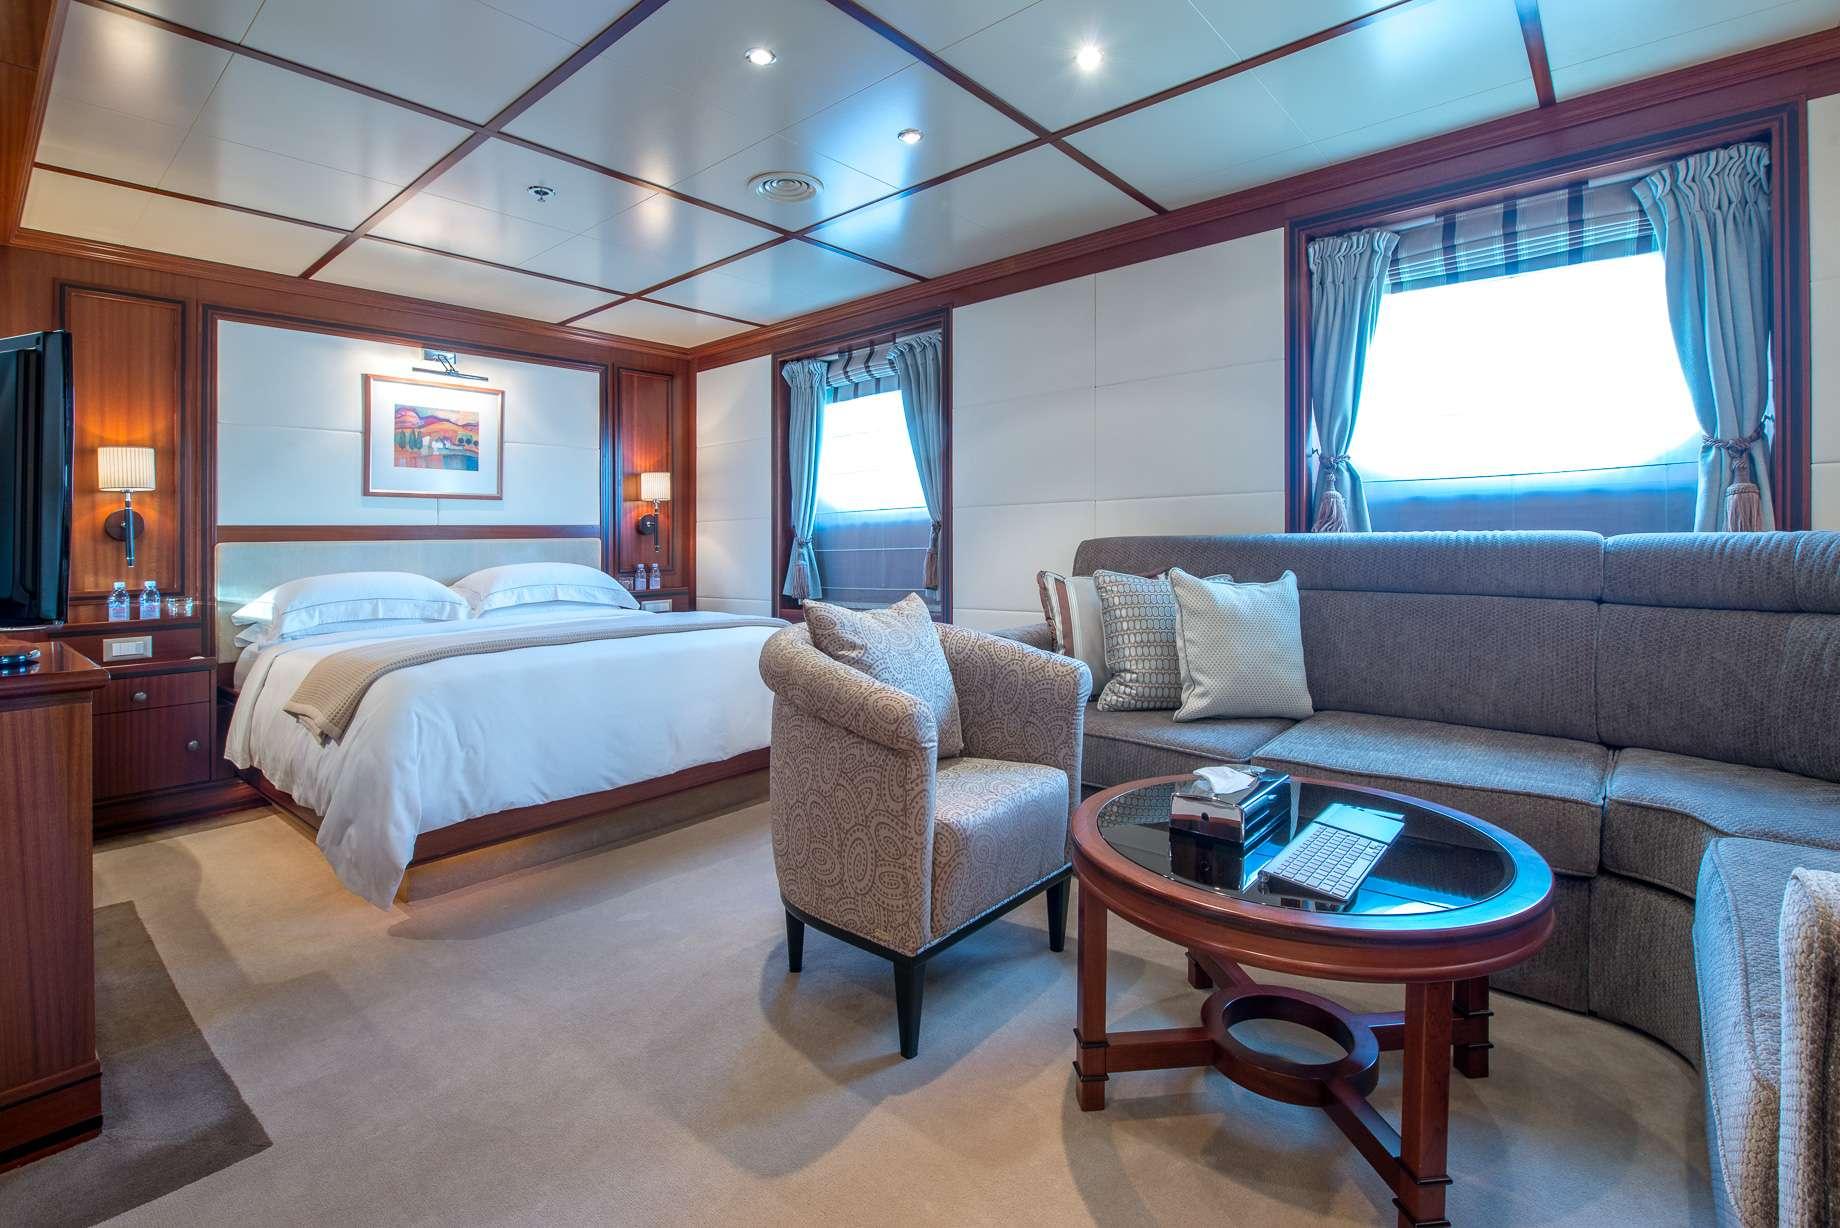 Motor Yacht 'LAUREN L' Excutive Cabin, 40 PAX, 295.00 Ft, 90.00 Meters, Built 2002, Cassens Werft, Refit Year 2008/2015